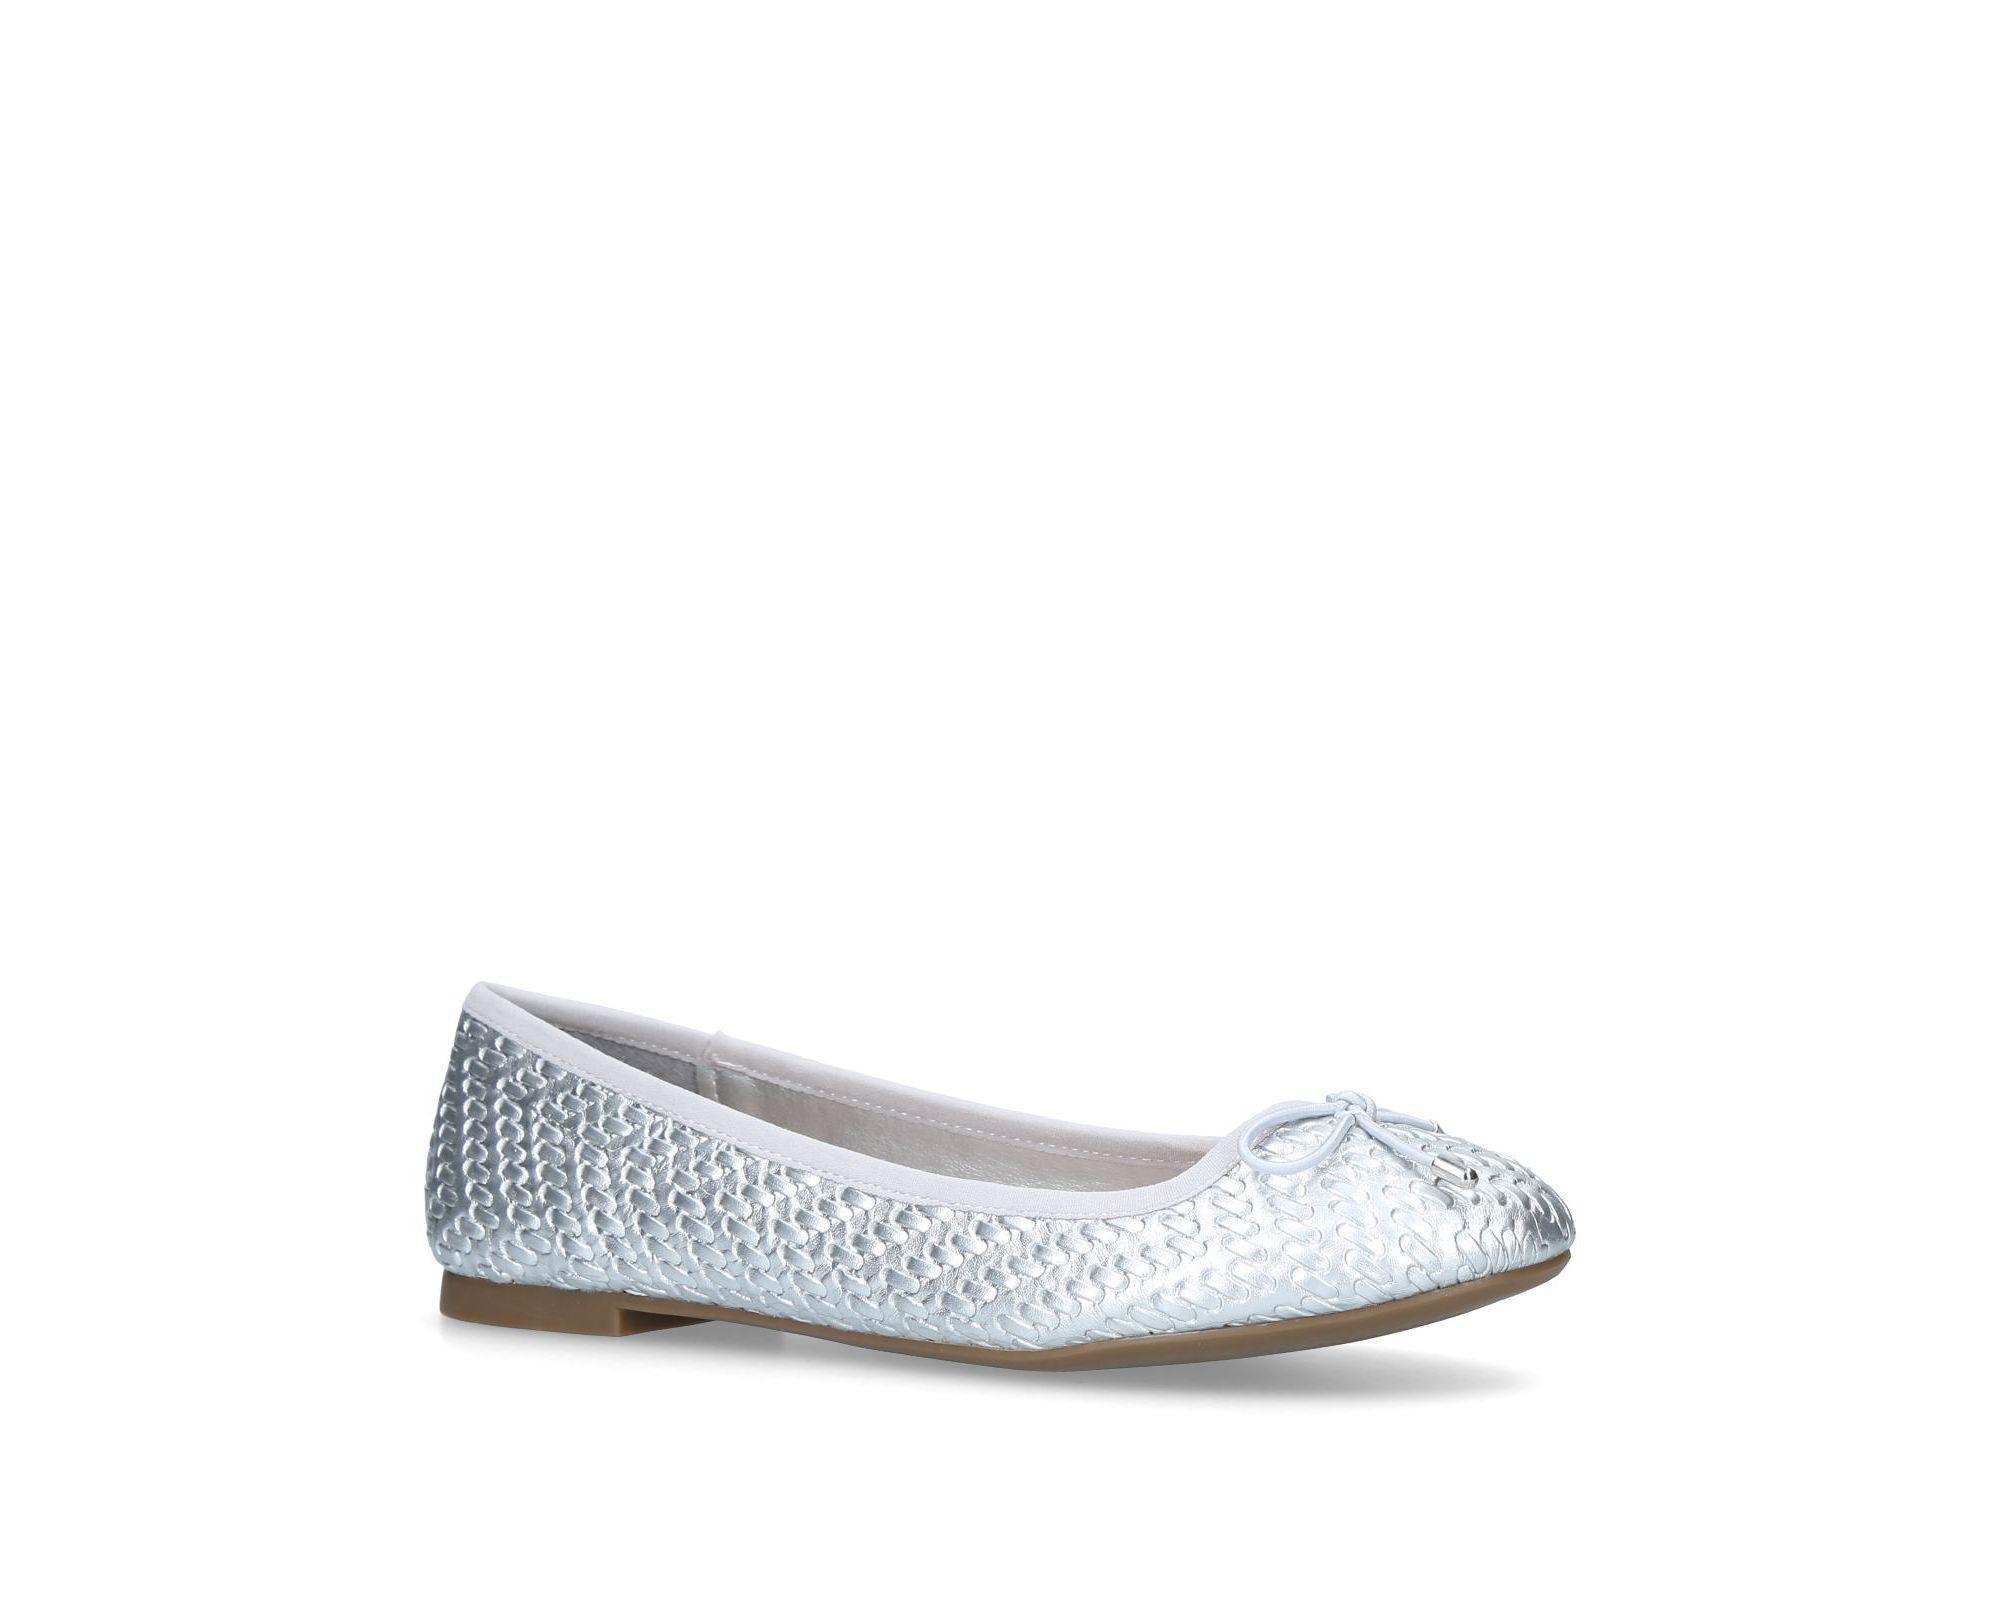 db55e1255 Miss Kg Silver  nellie  Flat Ballerina Shoes in Metallic - Lyst